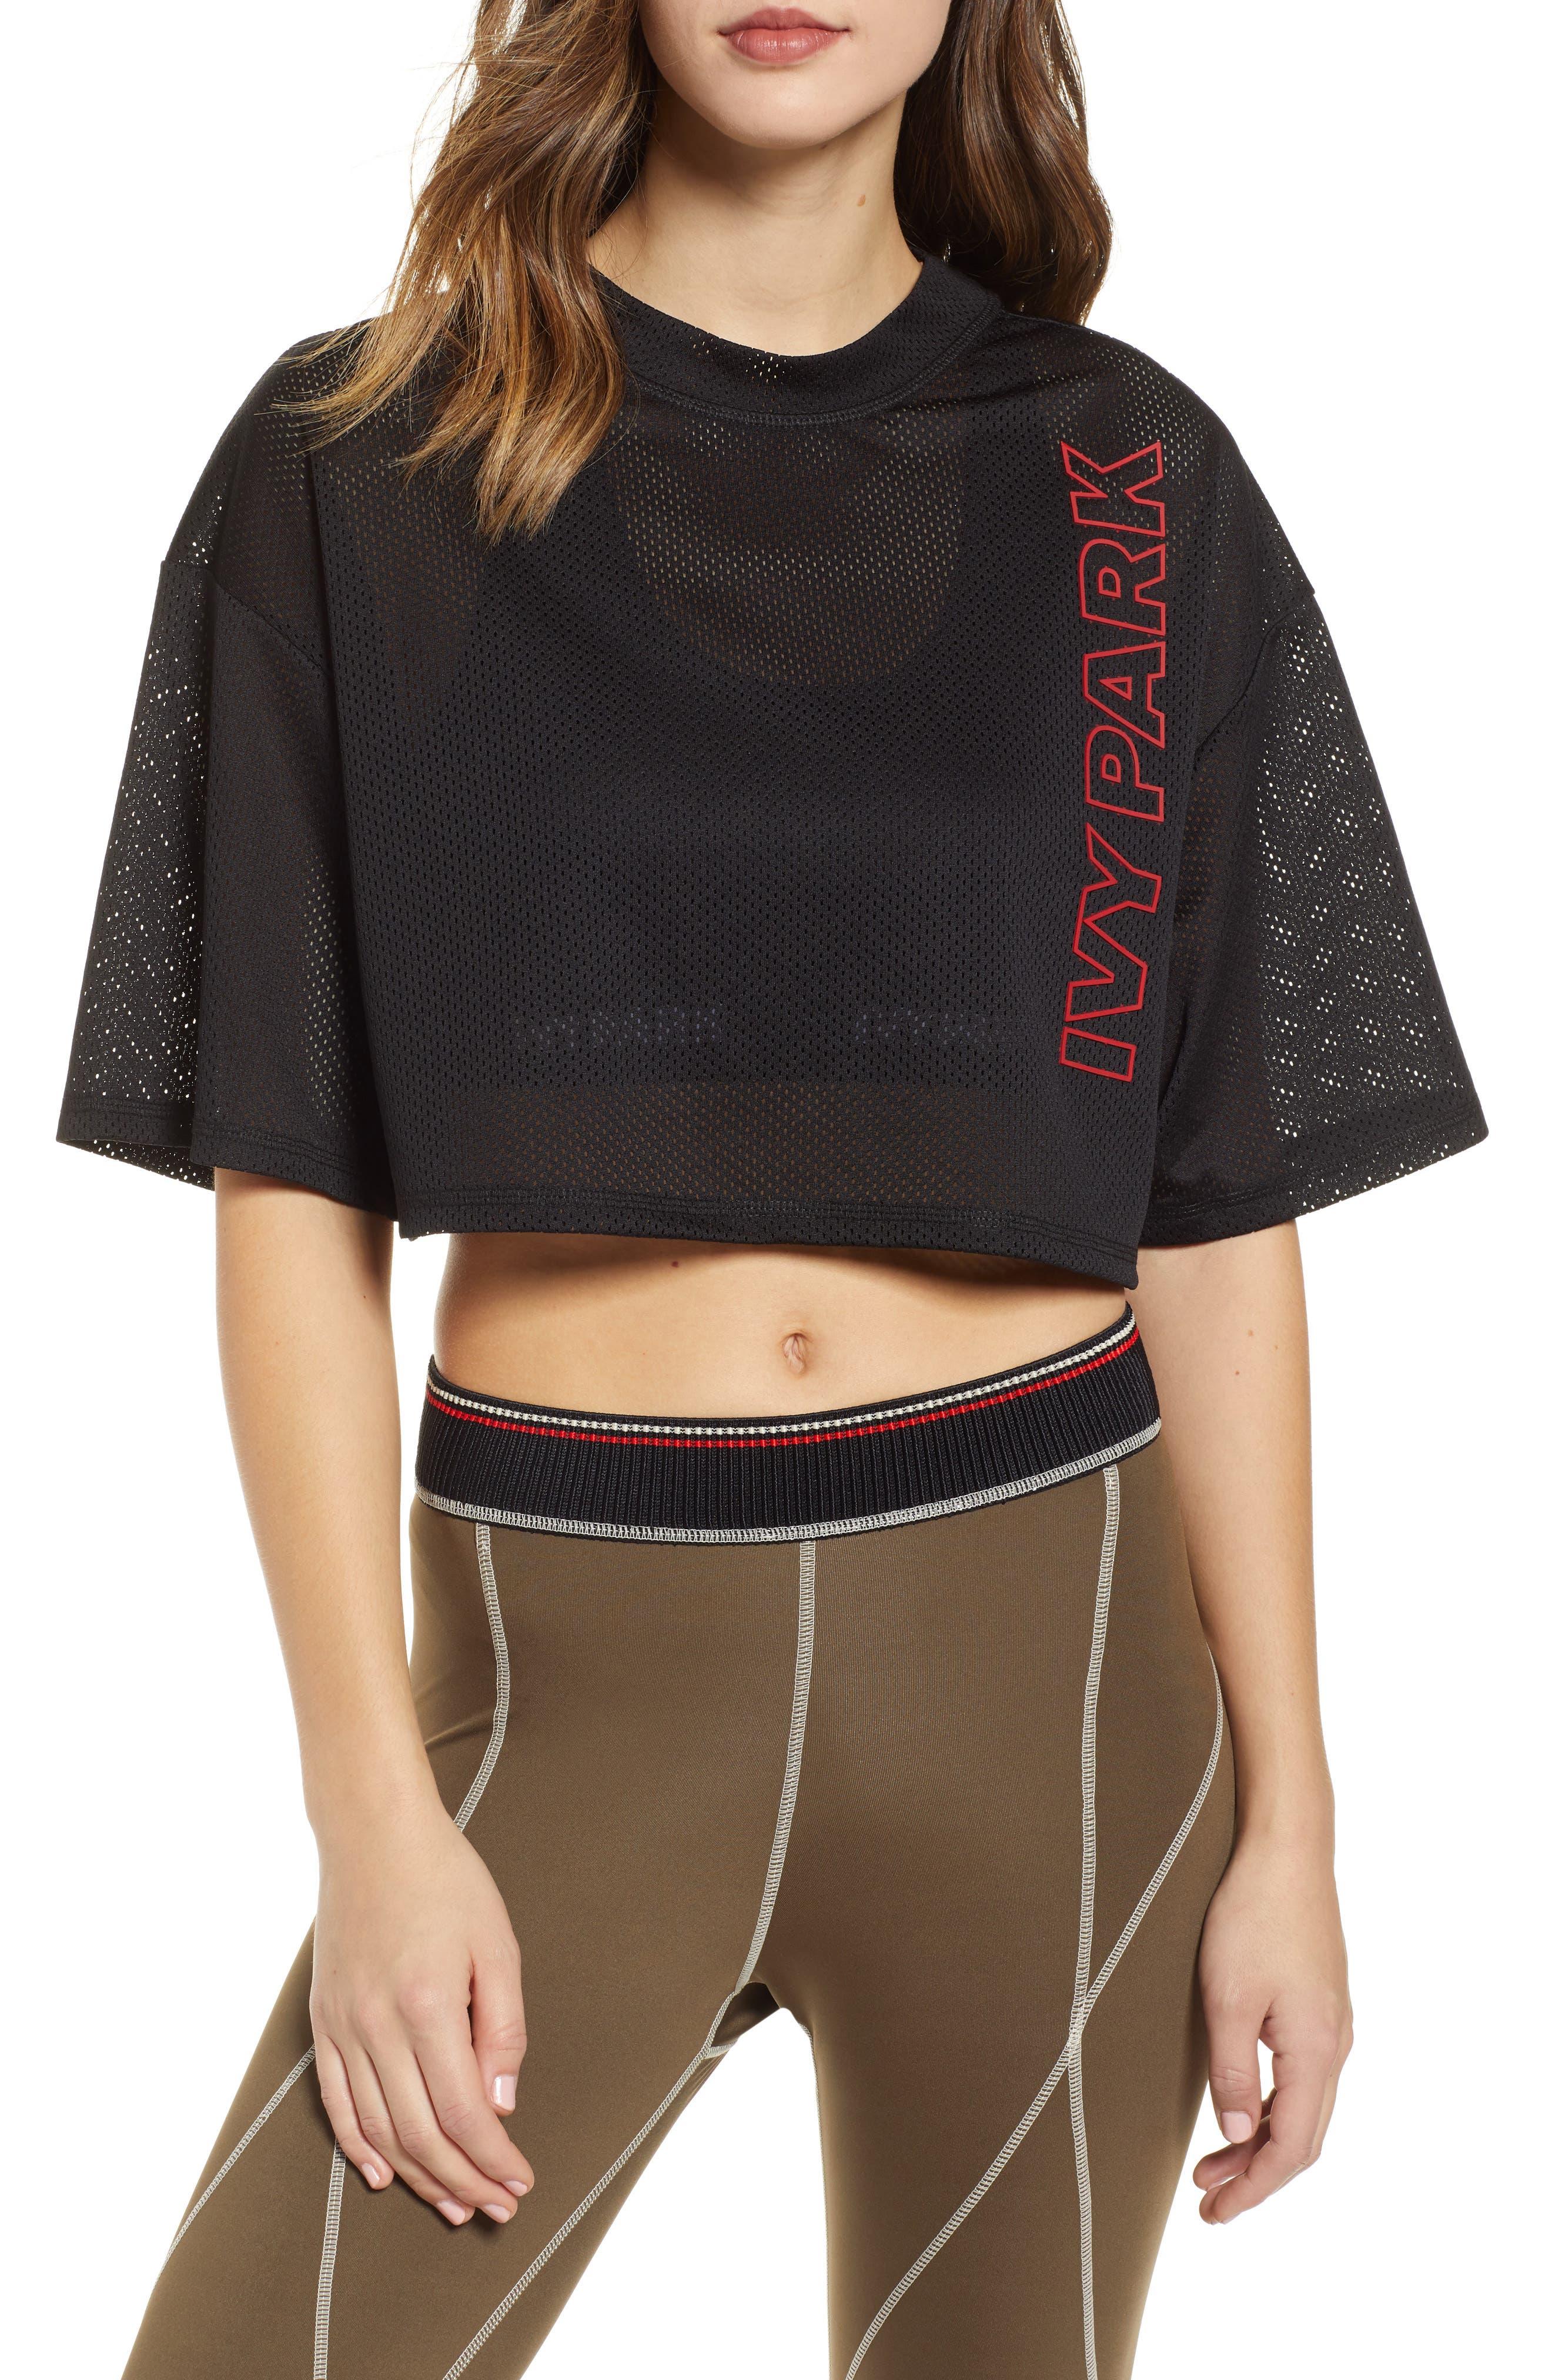 514bc07b8f4a9 Women s IVY PARK® Clothing